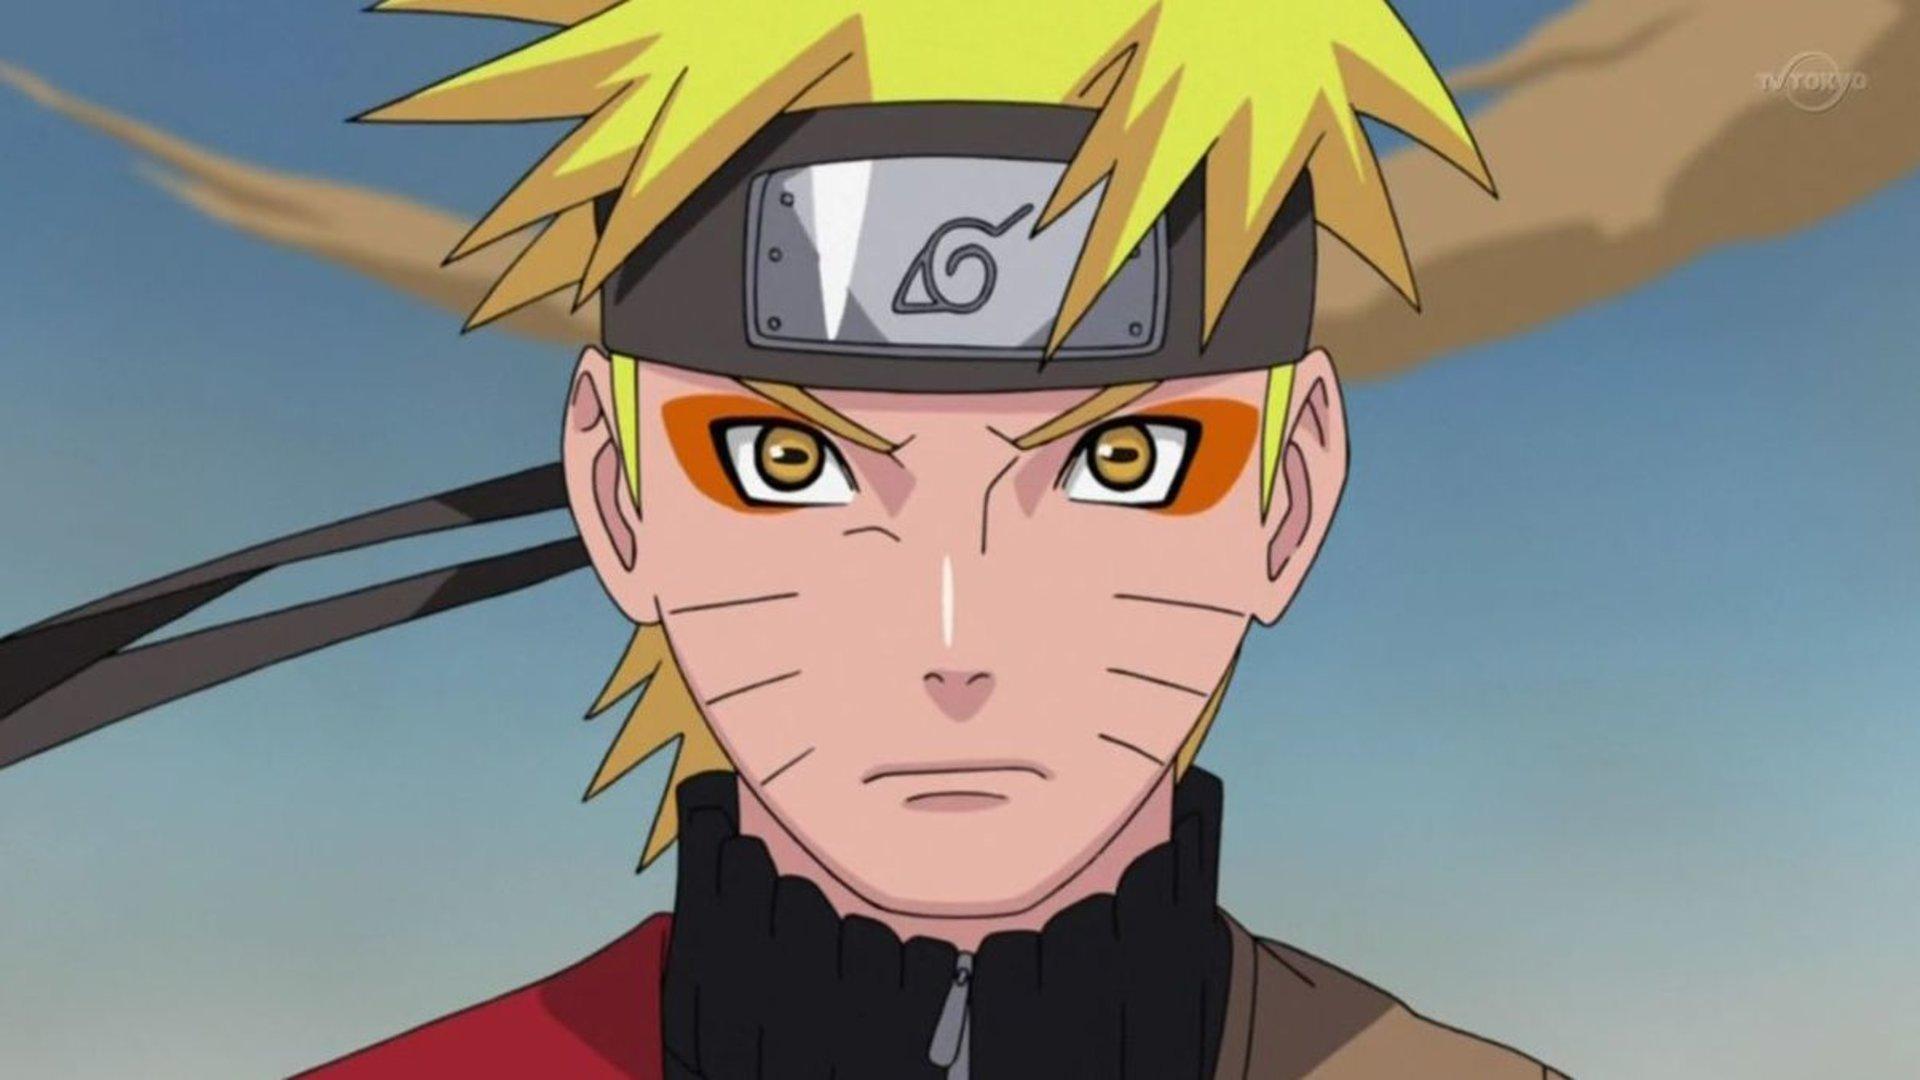 5 Shinobi Paling Menginspirasi di Anime Naruto 7